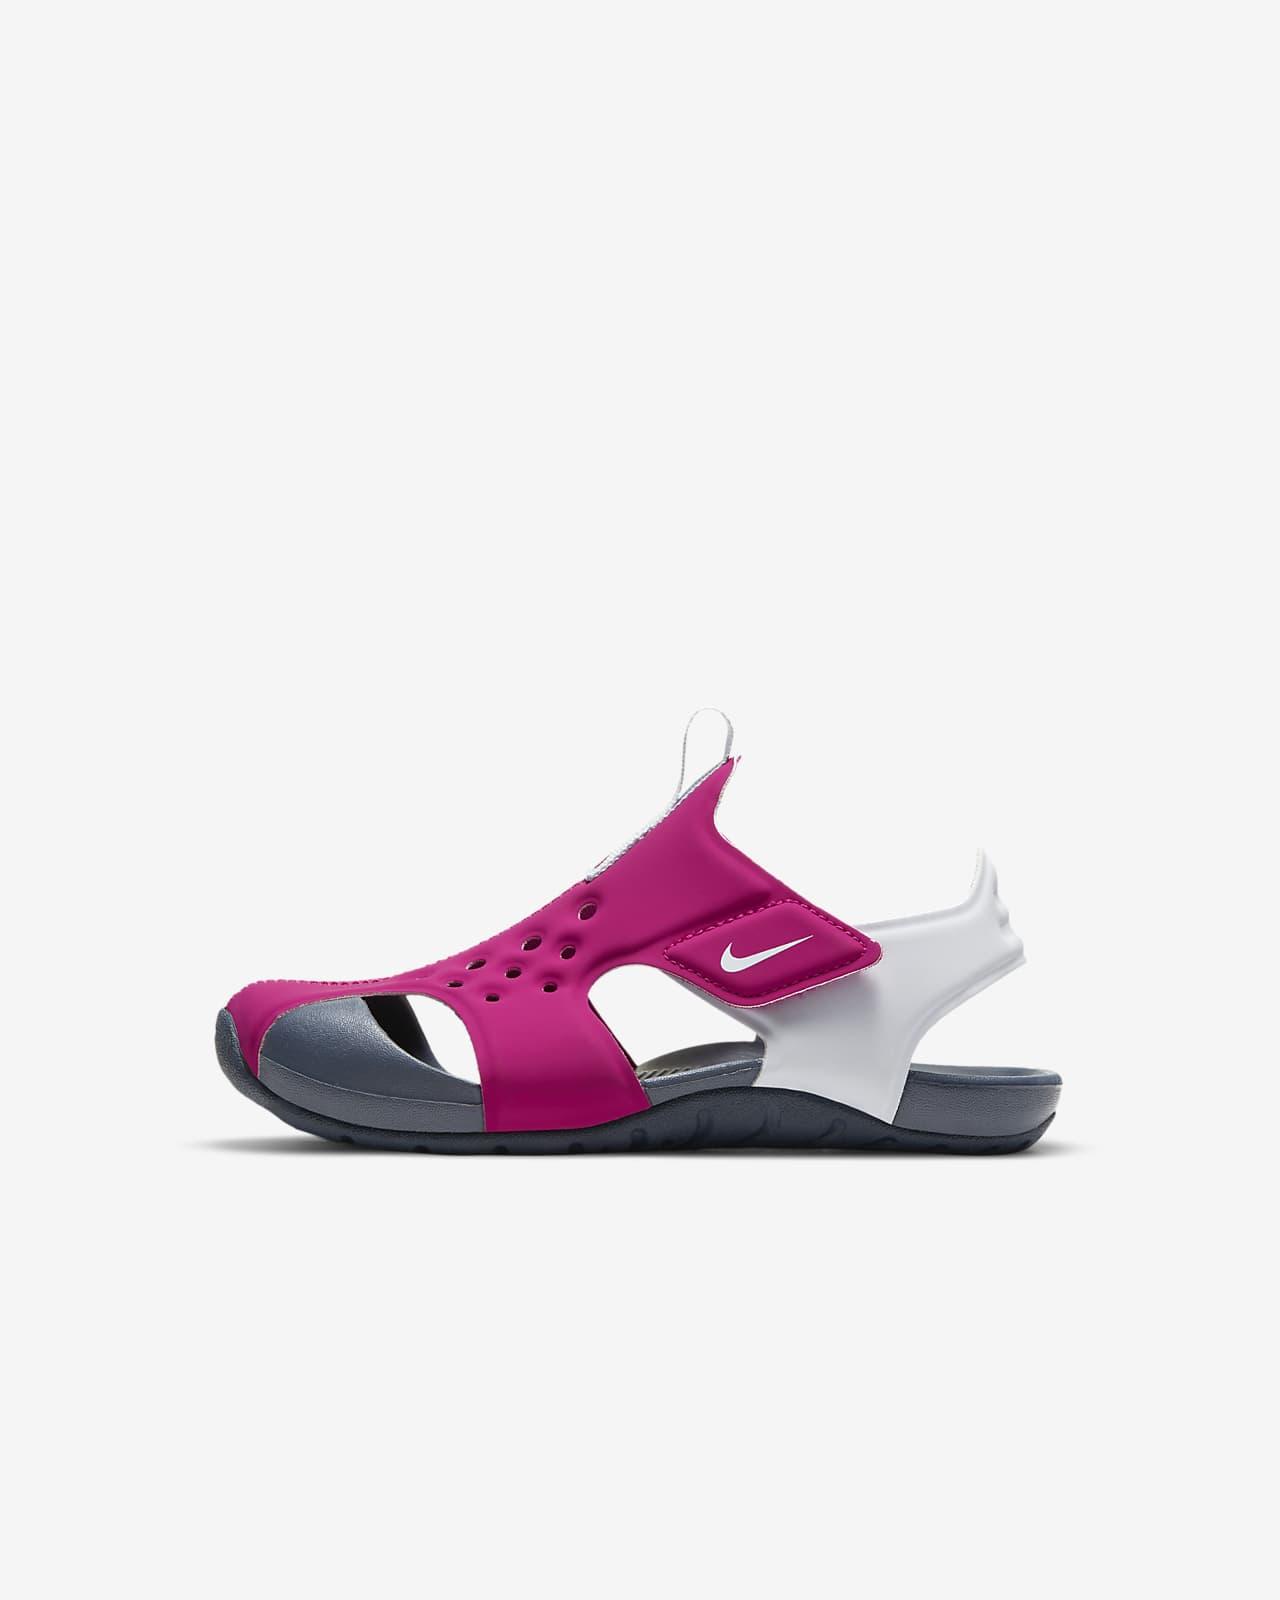 Nike Sunray Protect 2 Sandale für jüngere Kinder